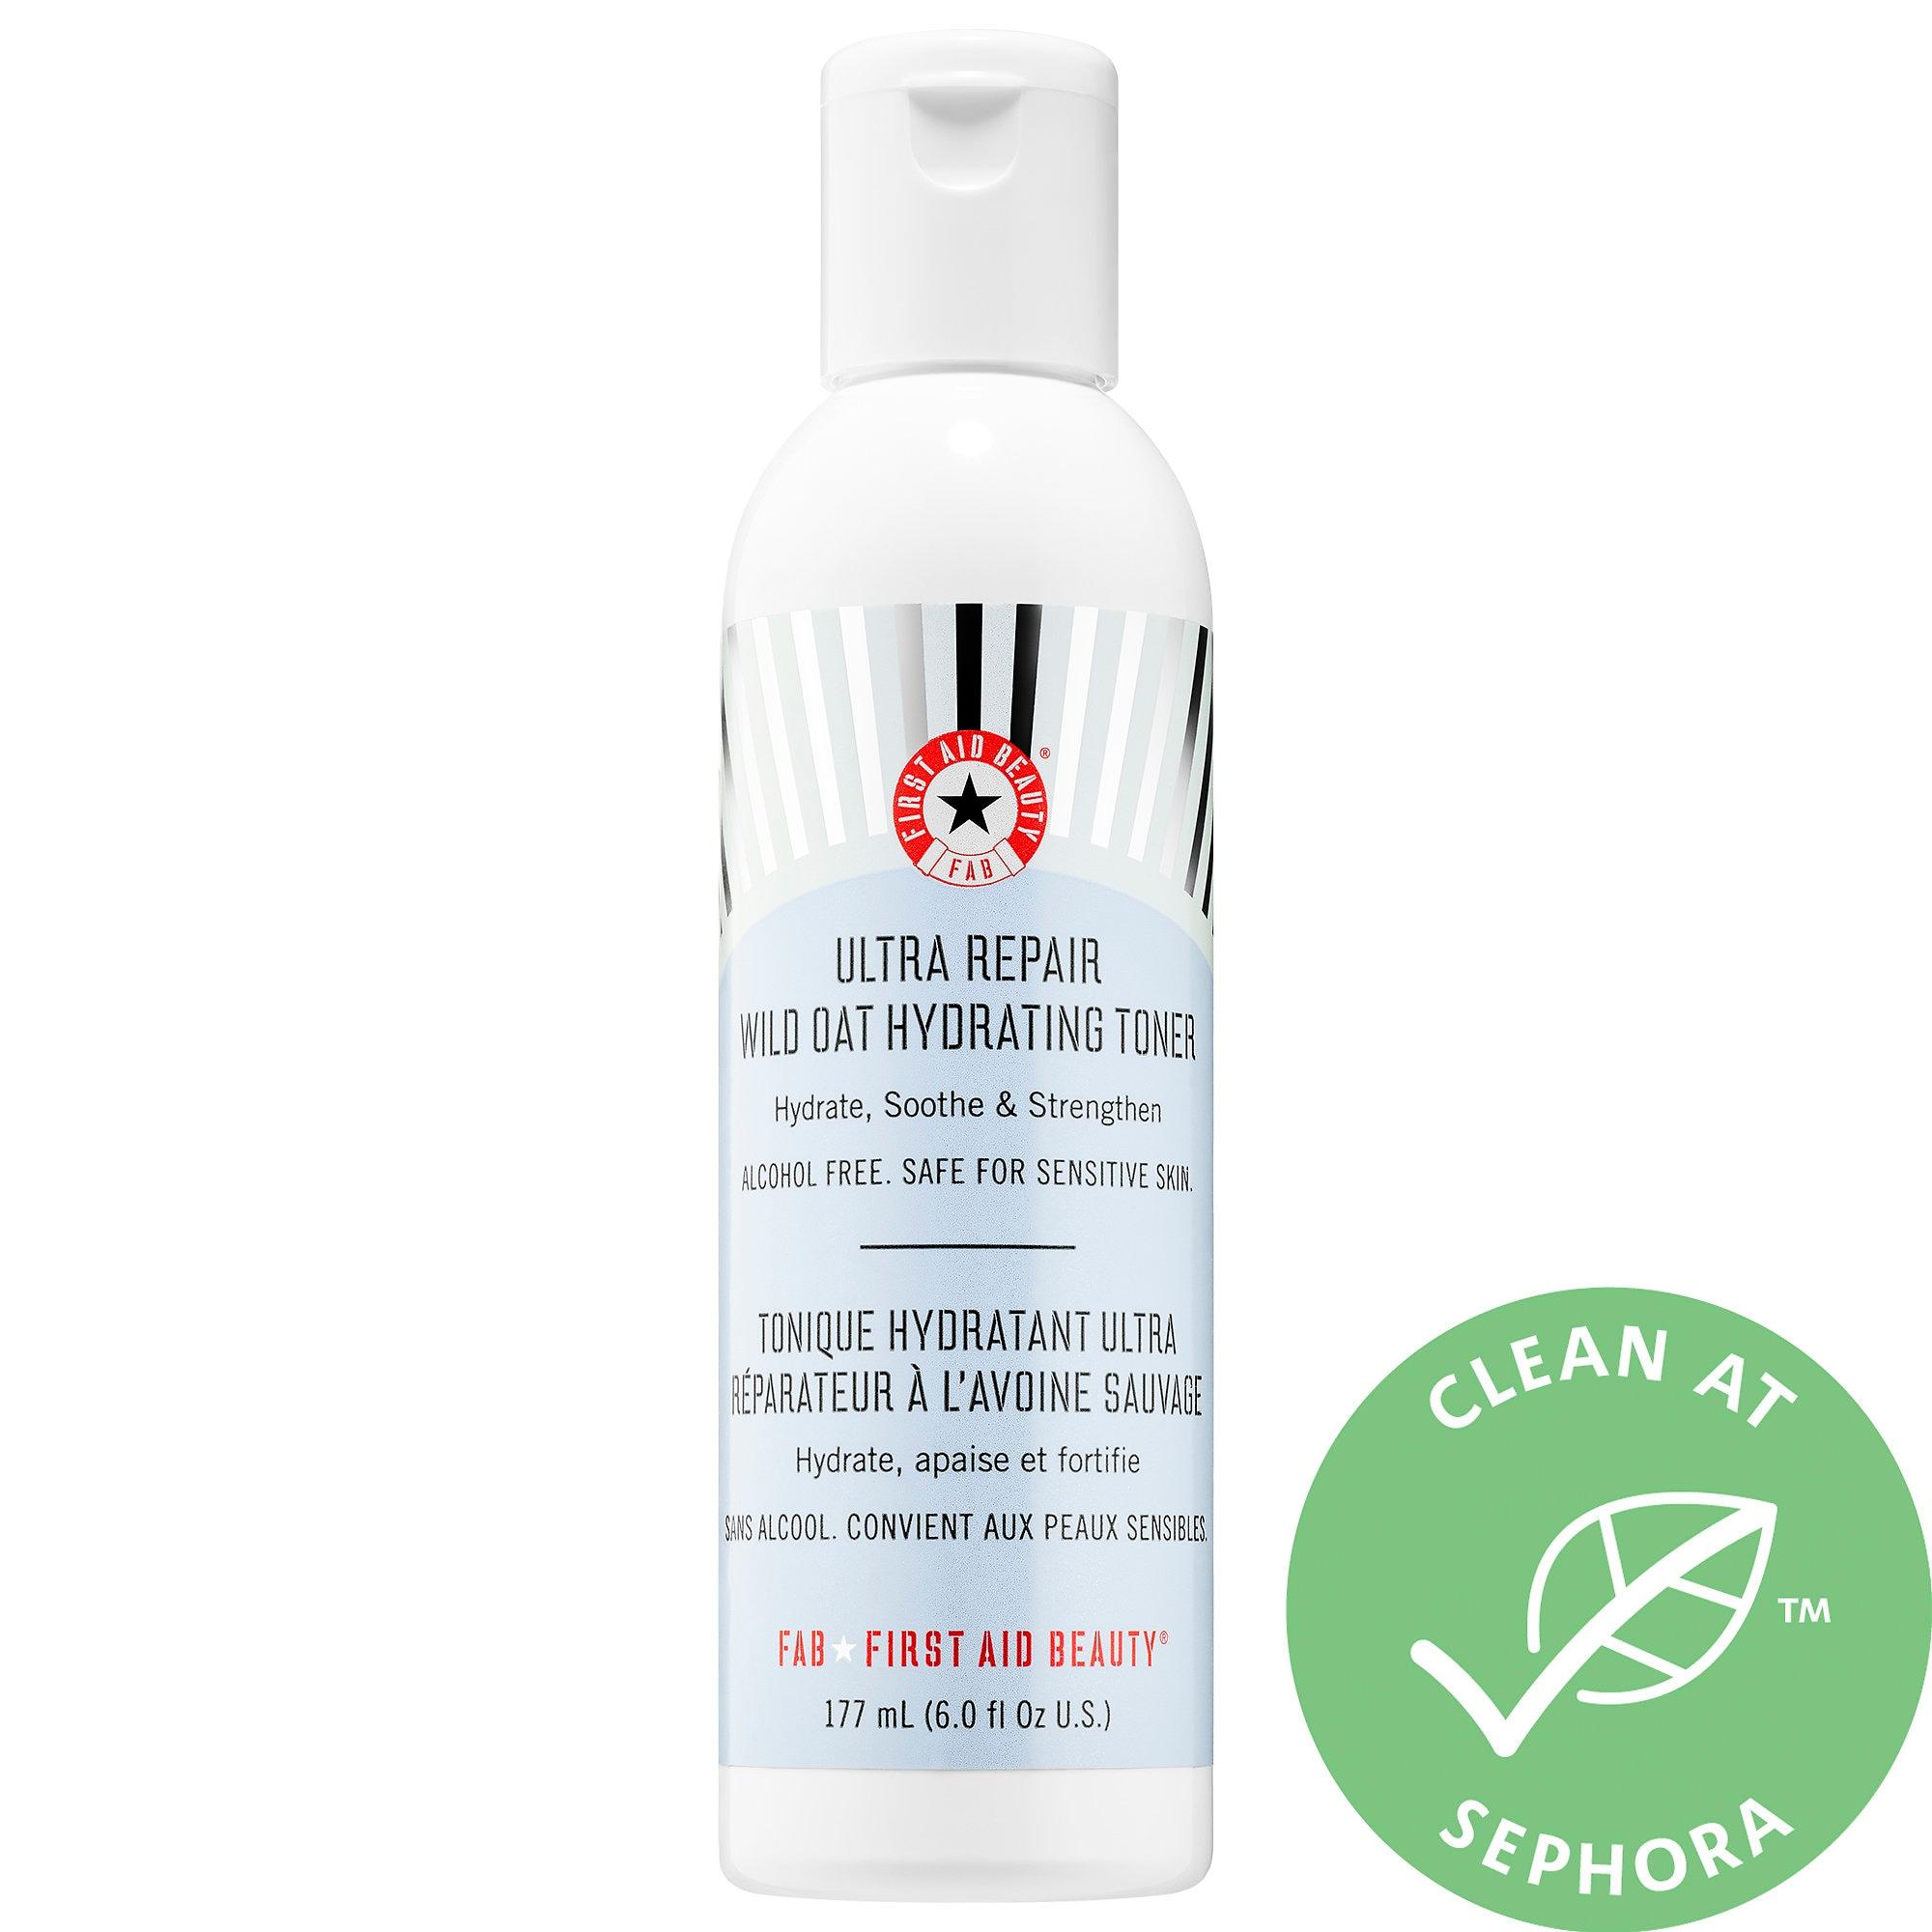 First Aid Beauty Ultra Repair Wild Oat Hydrating Toner 6 oz/ 177 mL